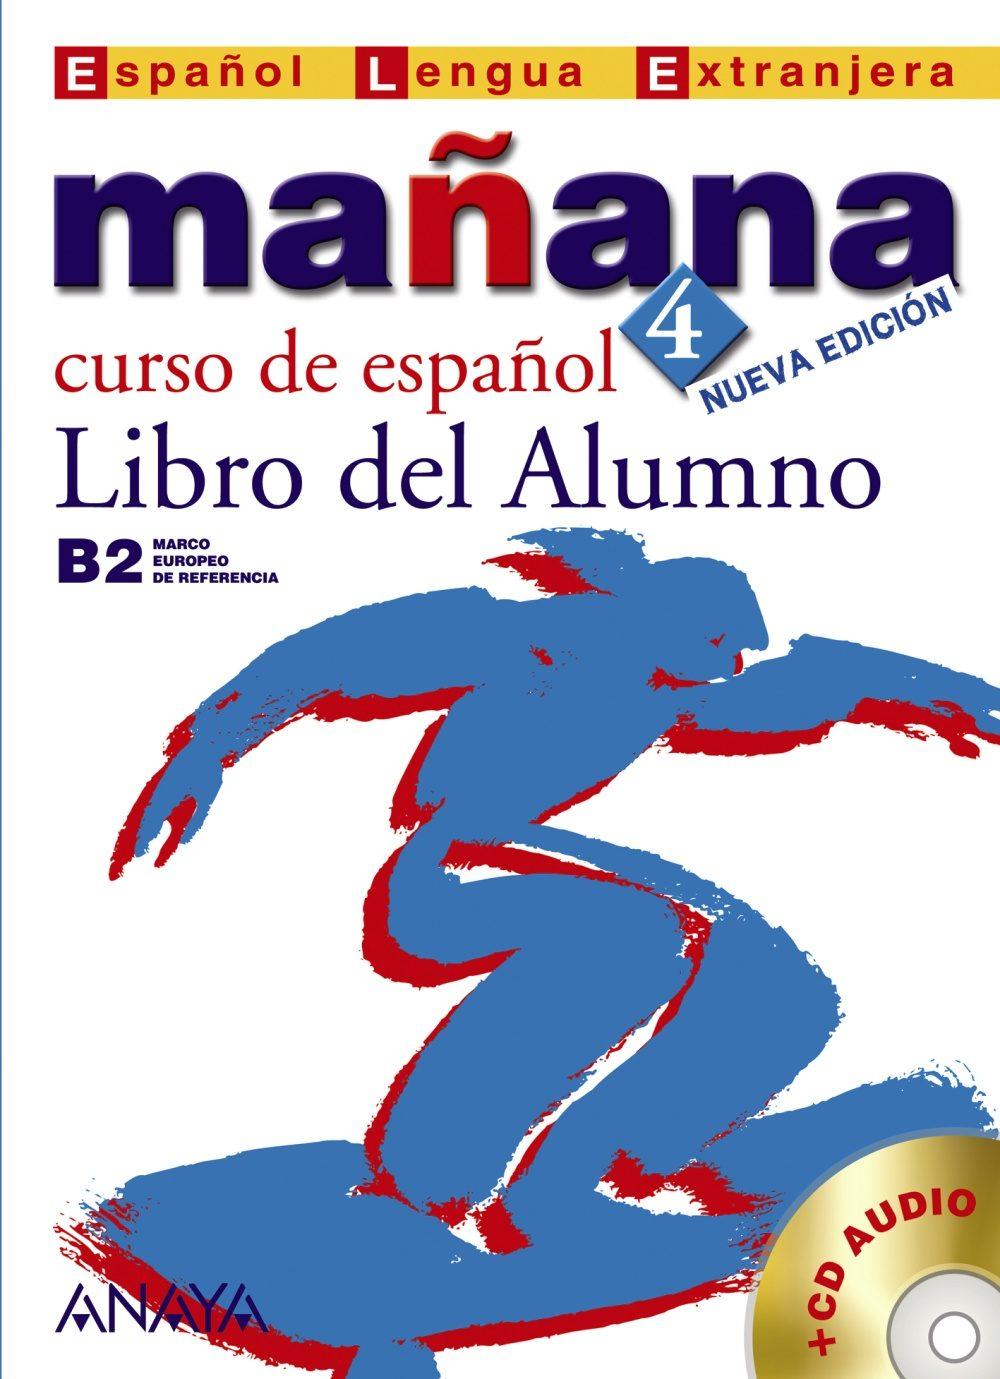 Mañana 4: Libro Del Alumno (b2 Nivel Superior) (incluye Audio-cd) (español Lengua Extranjera) por Vv.aa. Gratis